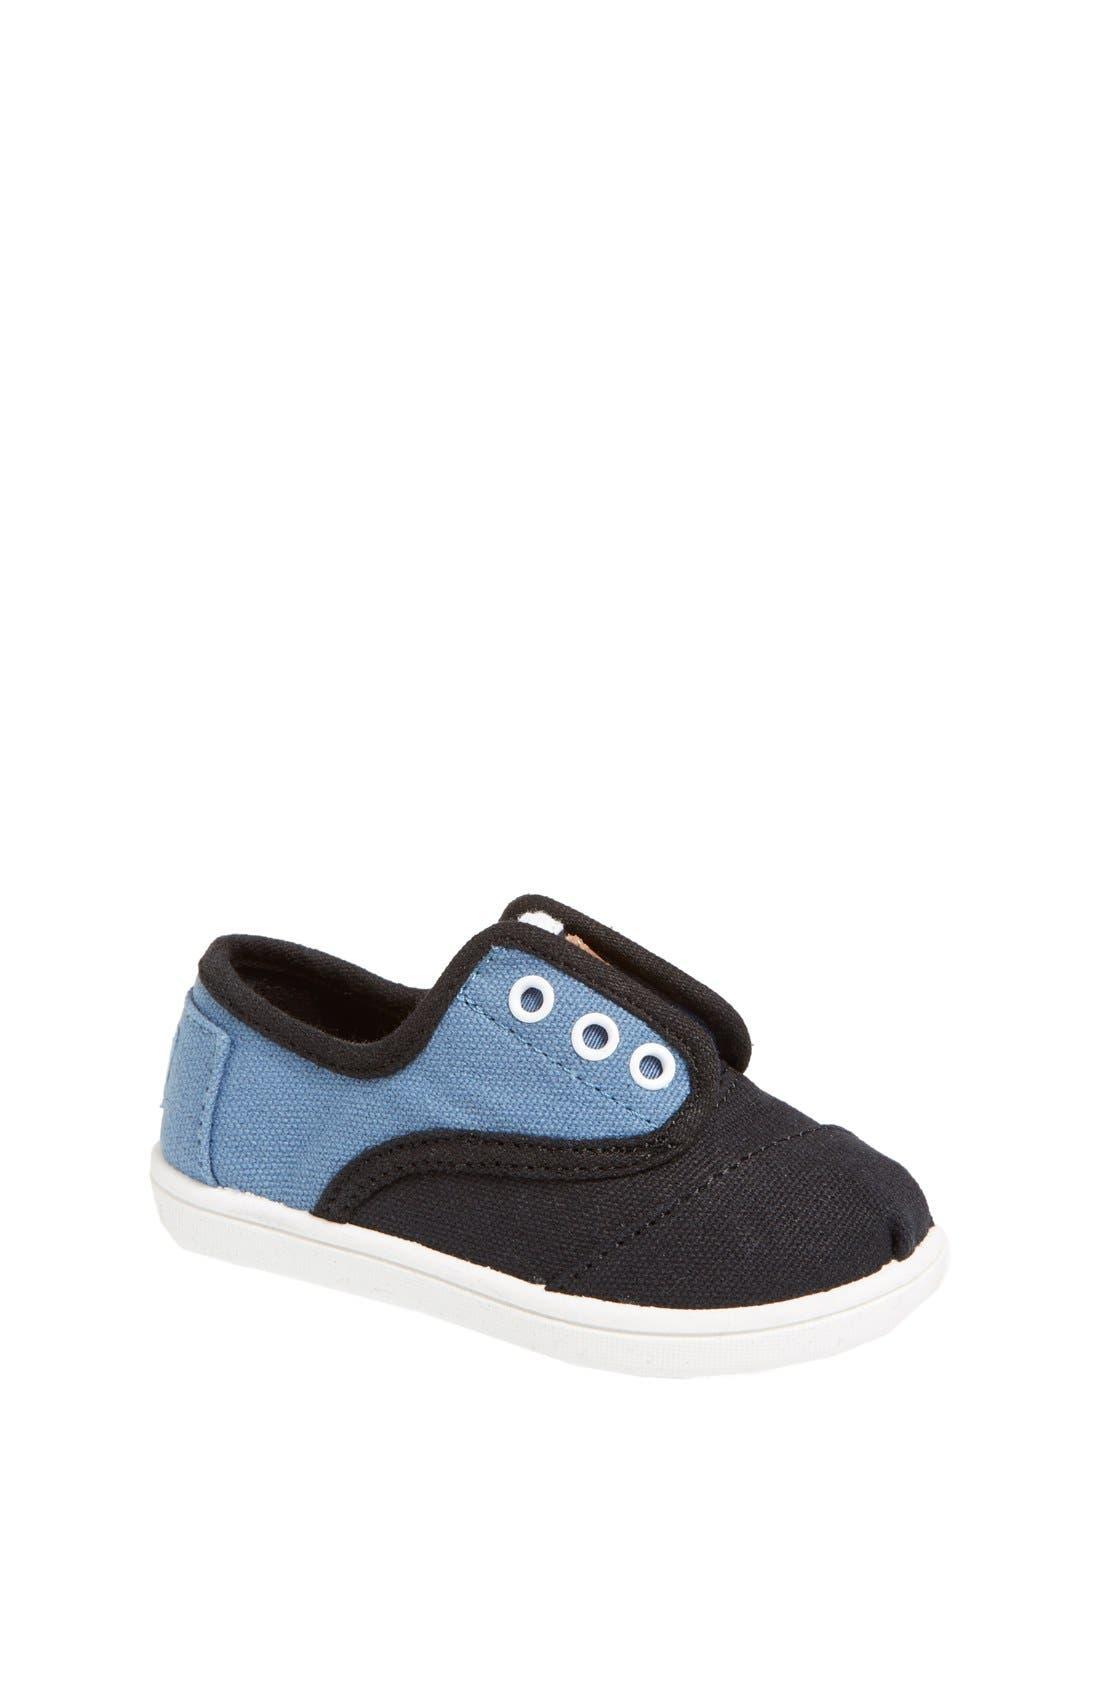 Main Image - TOMS 'Cordones - Tiny' Sneaker (Baby, Walker & Toddler)